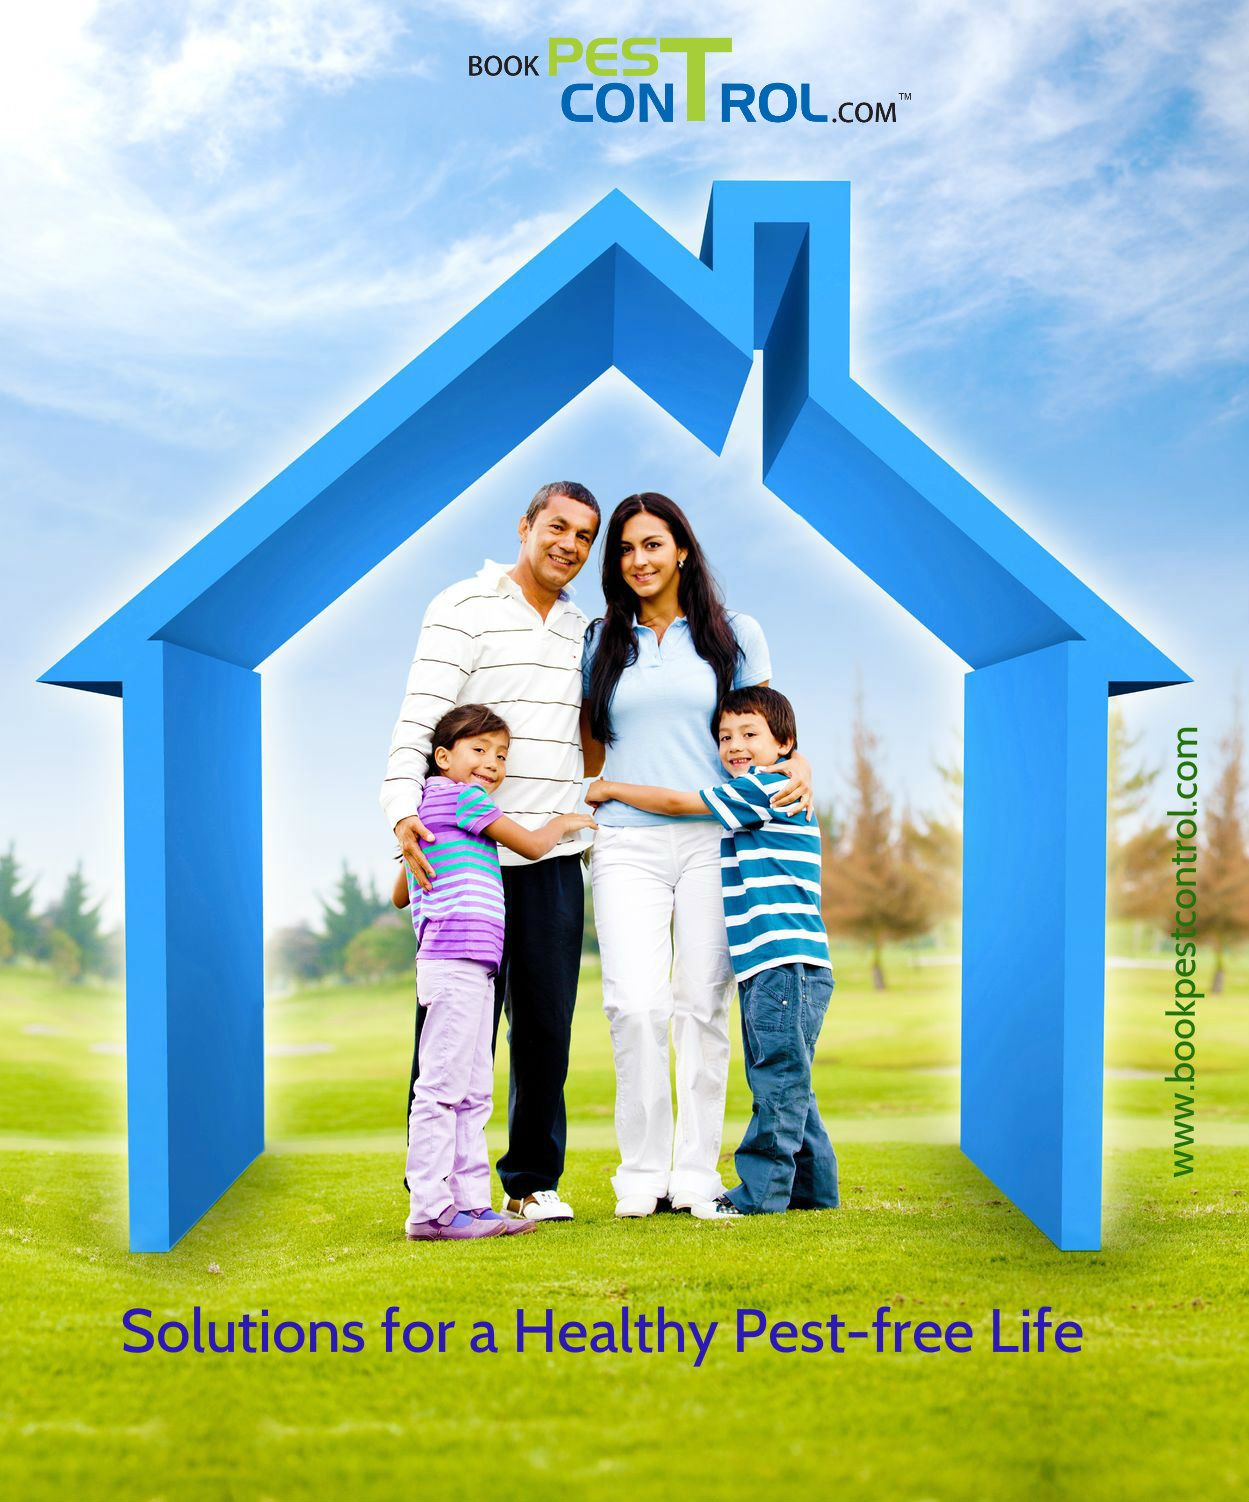 bookpestcontrol Home insurance quotes, Home insurance